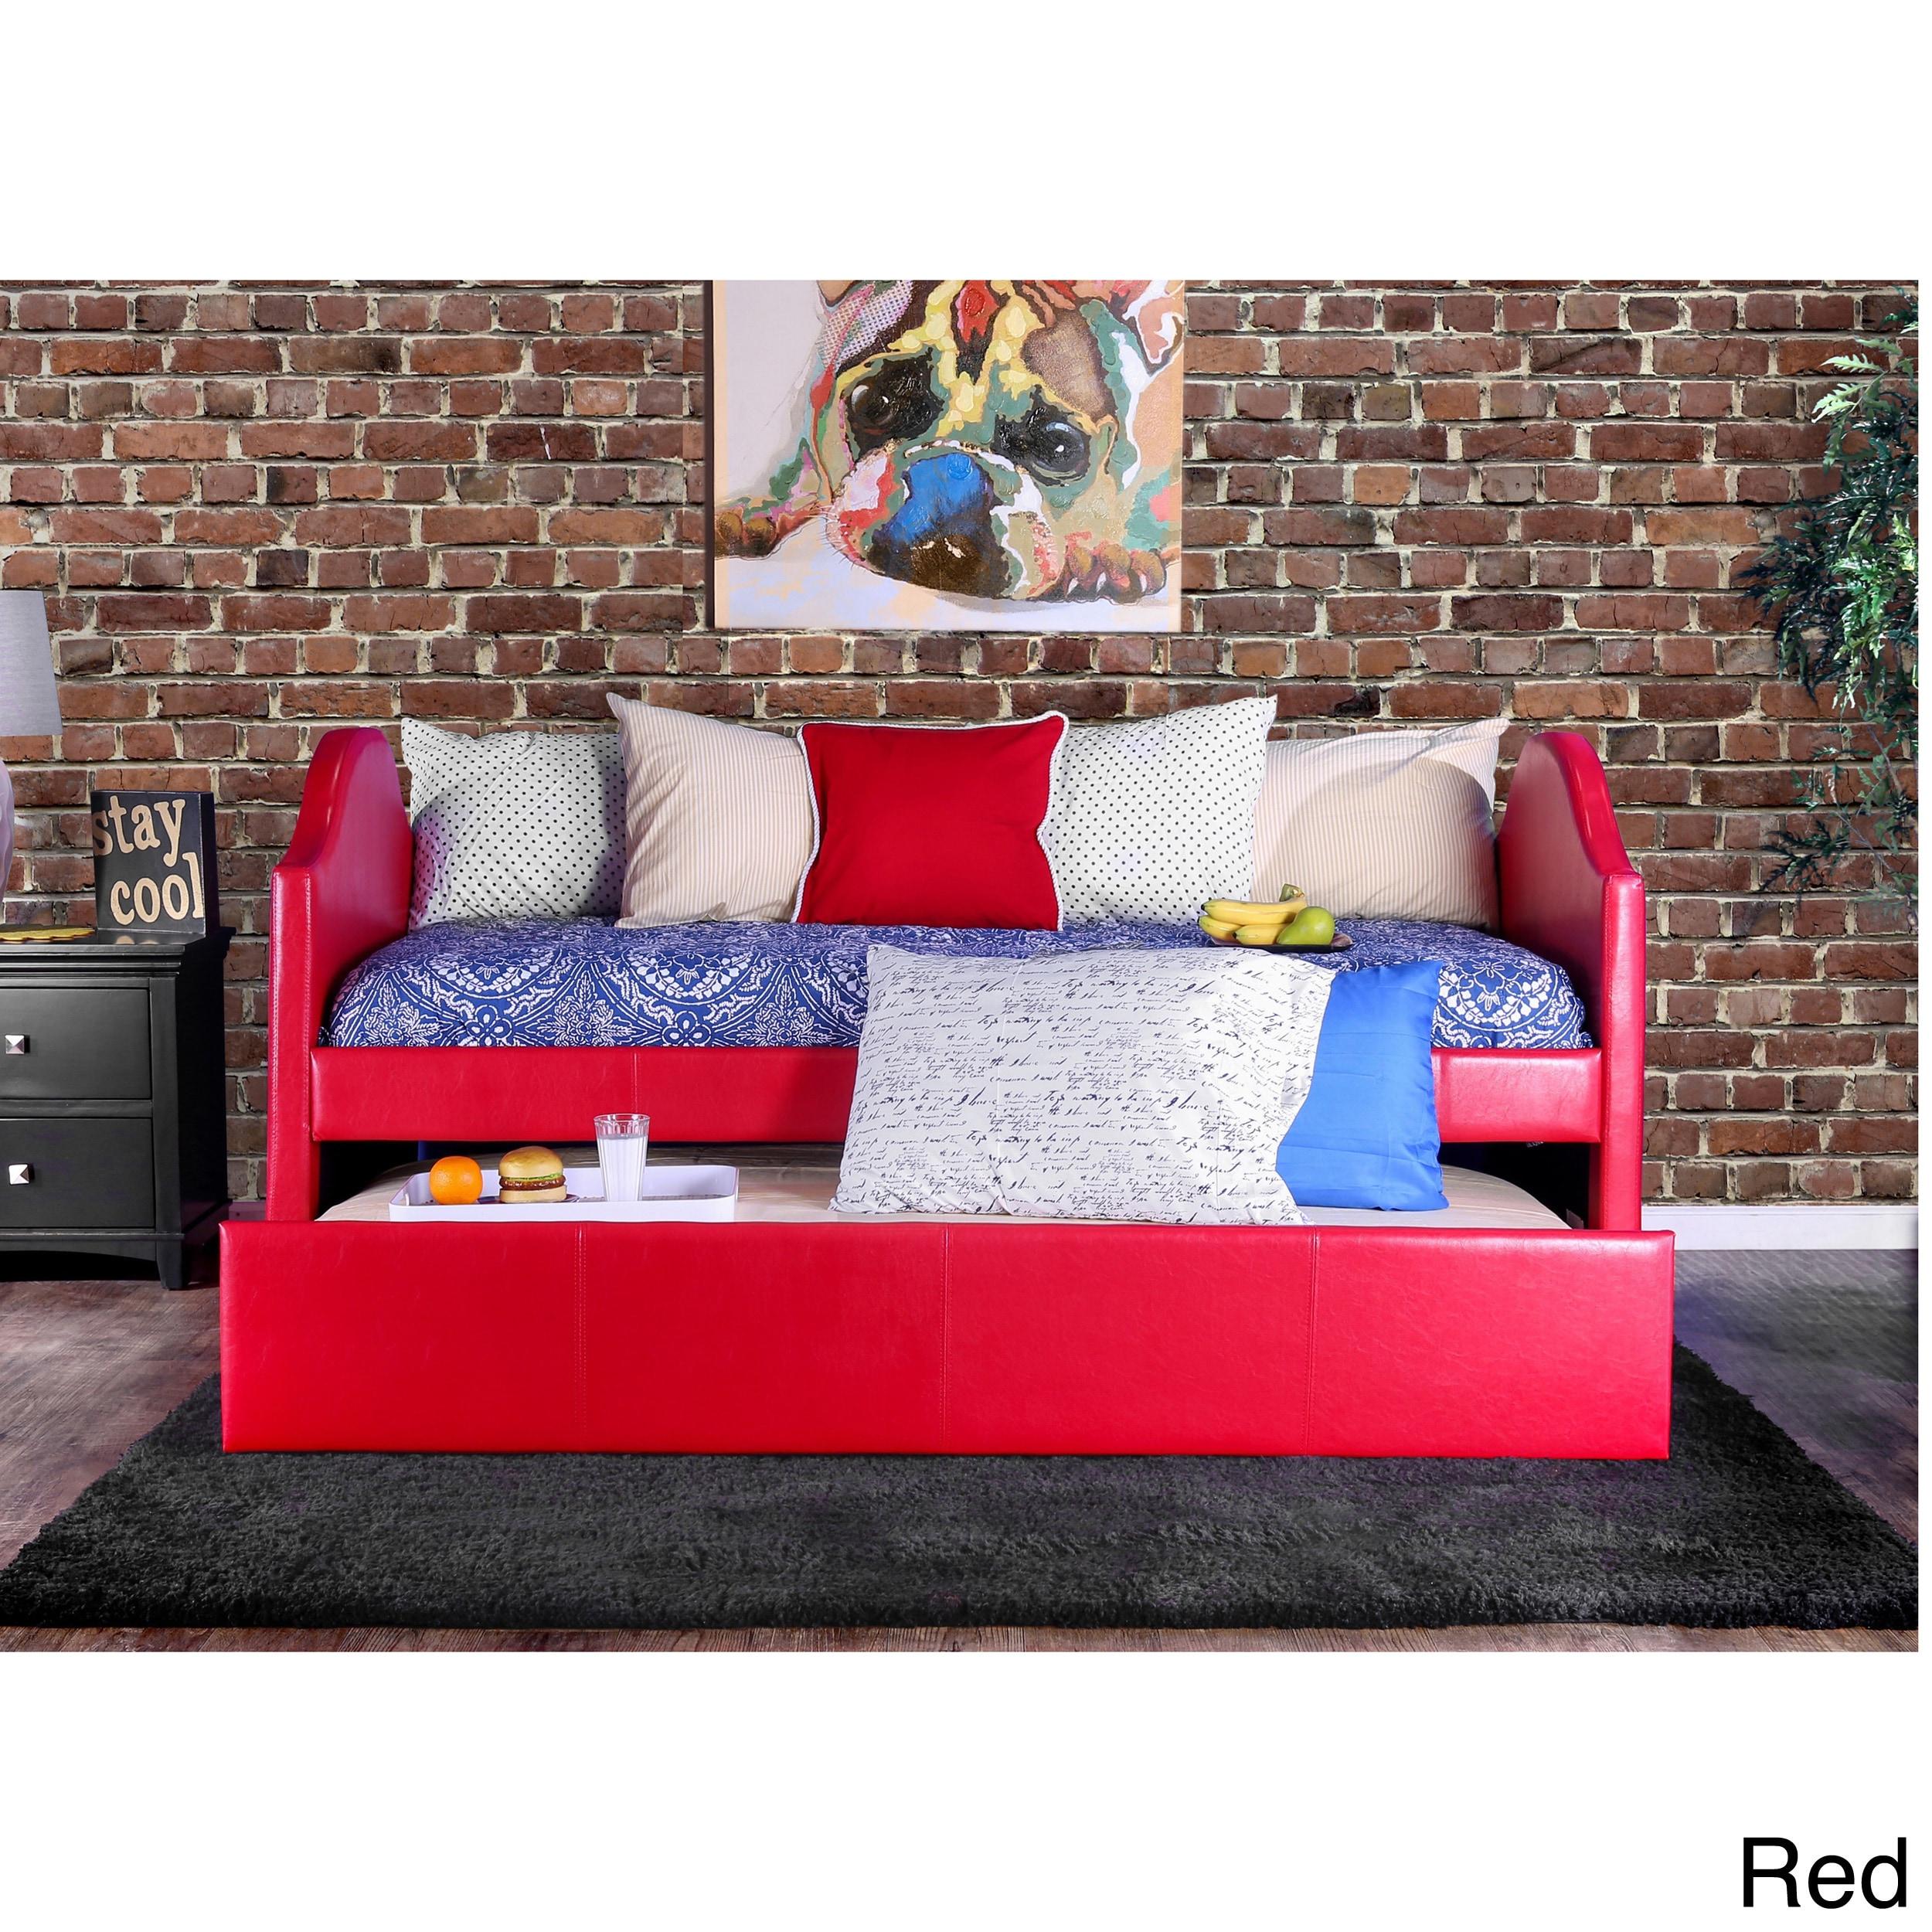 Furniture of America Camillia Leatherette Platform with T...